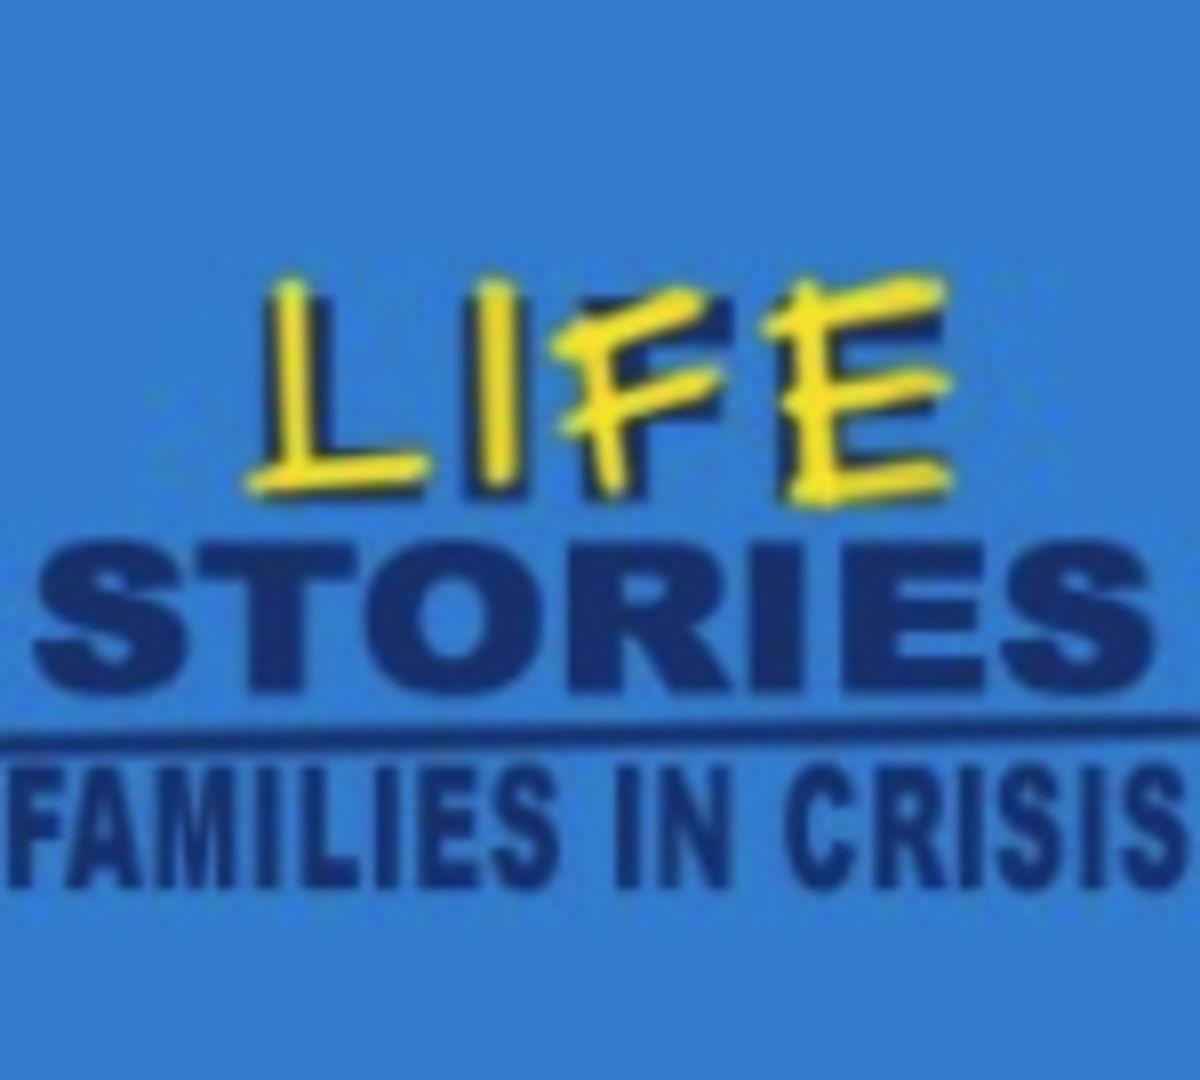 Show Lifestories: Families in Crisis